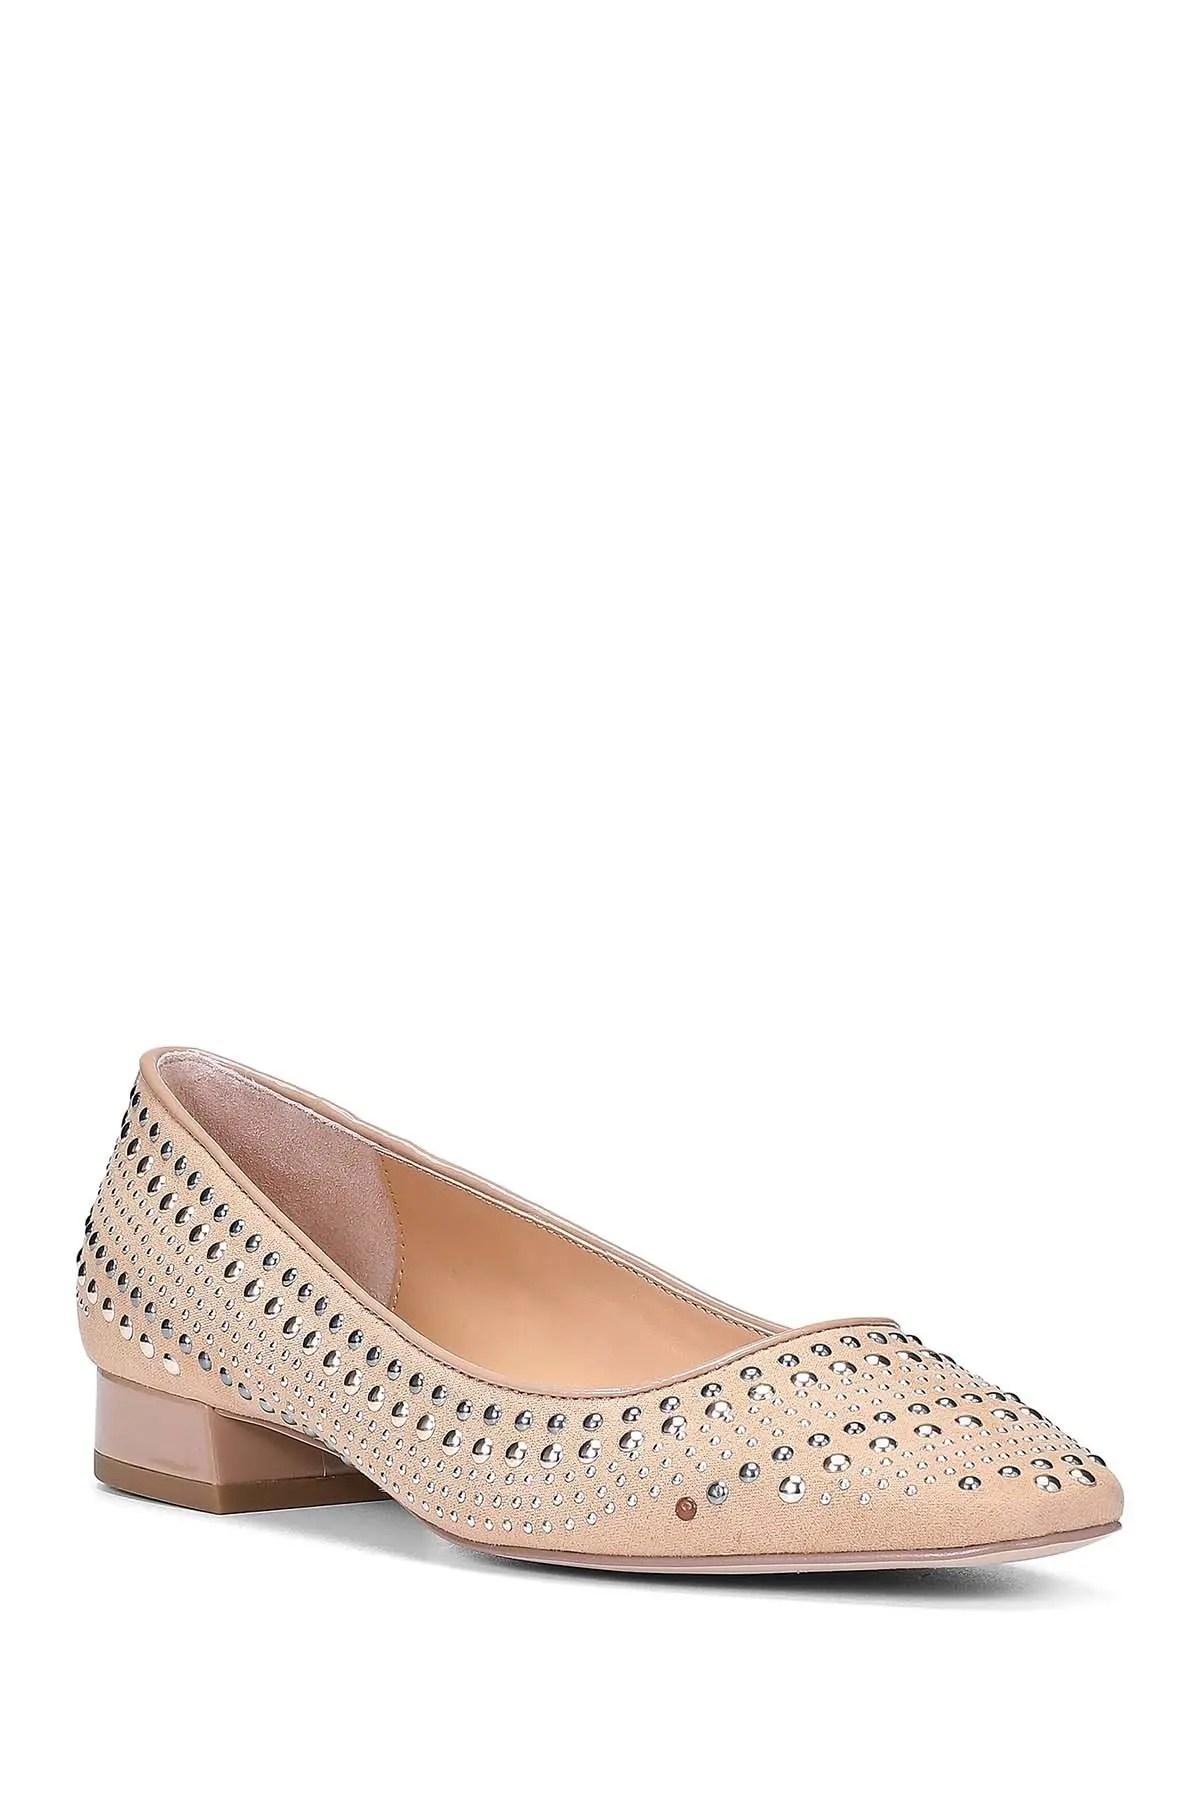 donald pliner women s shoes nordstrom